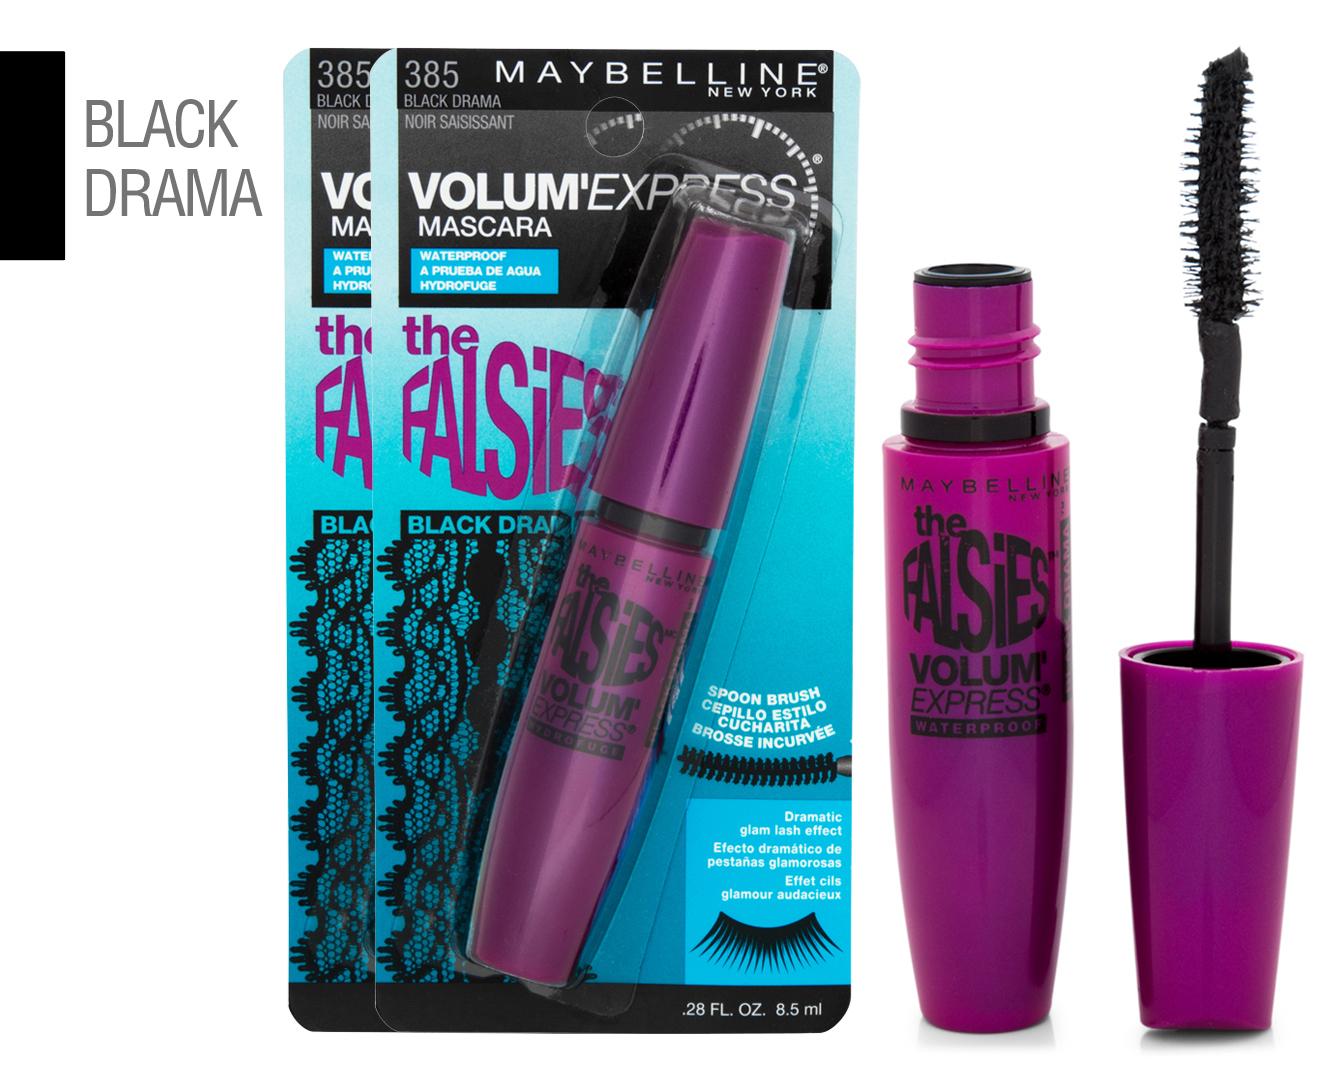 a63af80a83d 2 x Maybelline Volum' Express Falsies Mascara 8.5mL - #385 Black Drama |  Catch.com.au